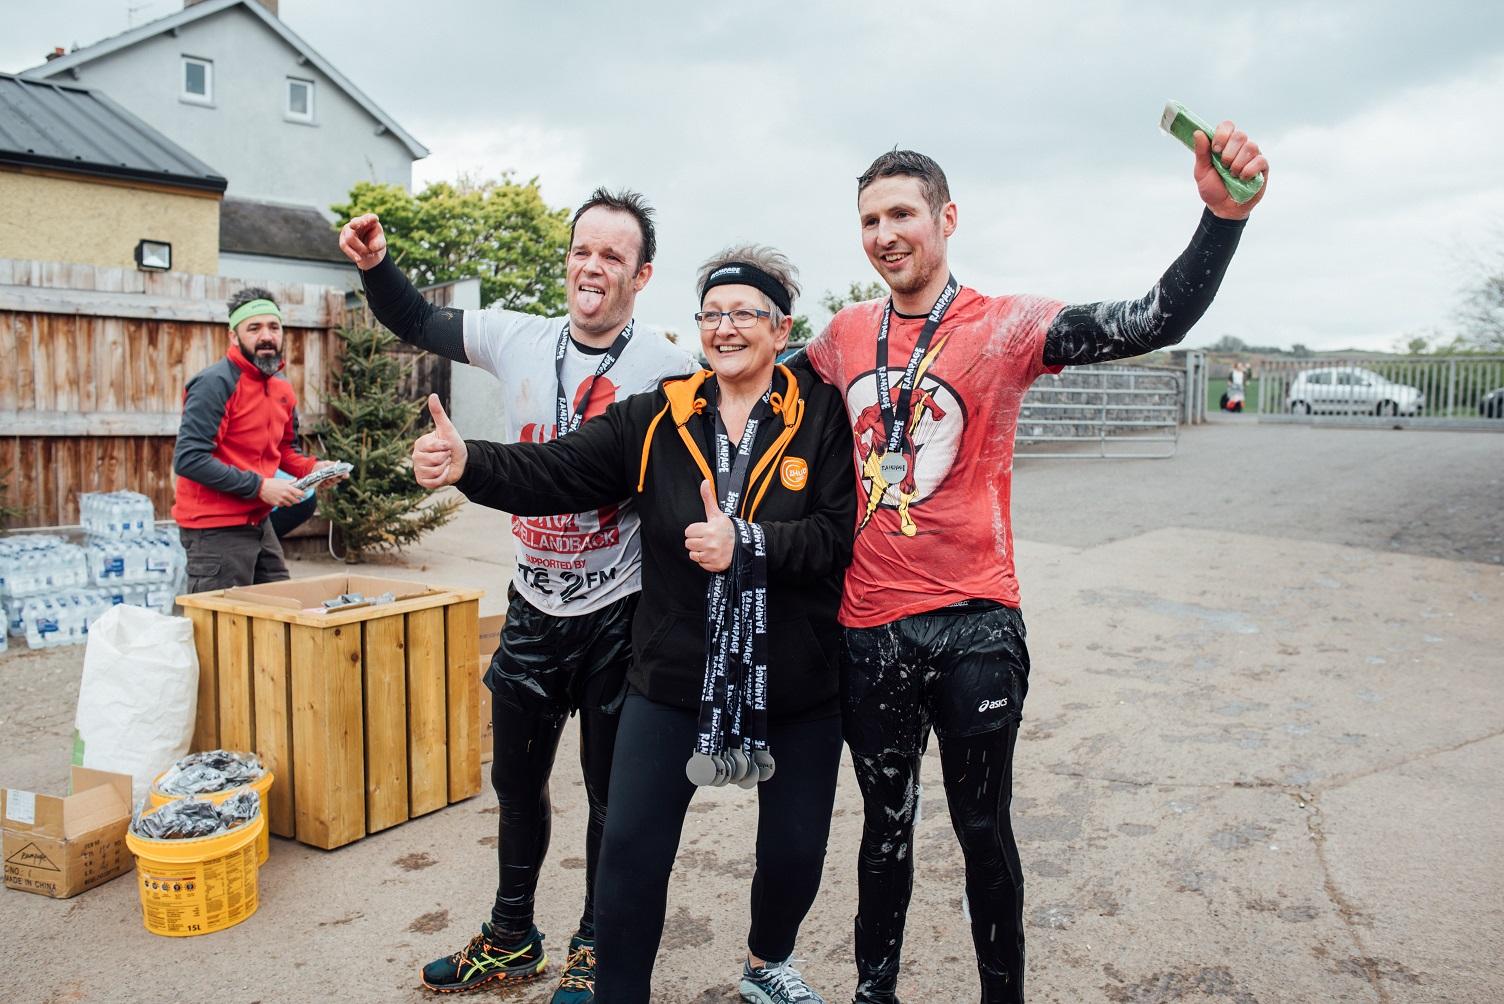 Carol Hub with 2 guys at finish line celebrating